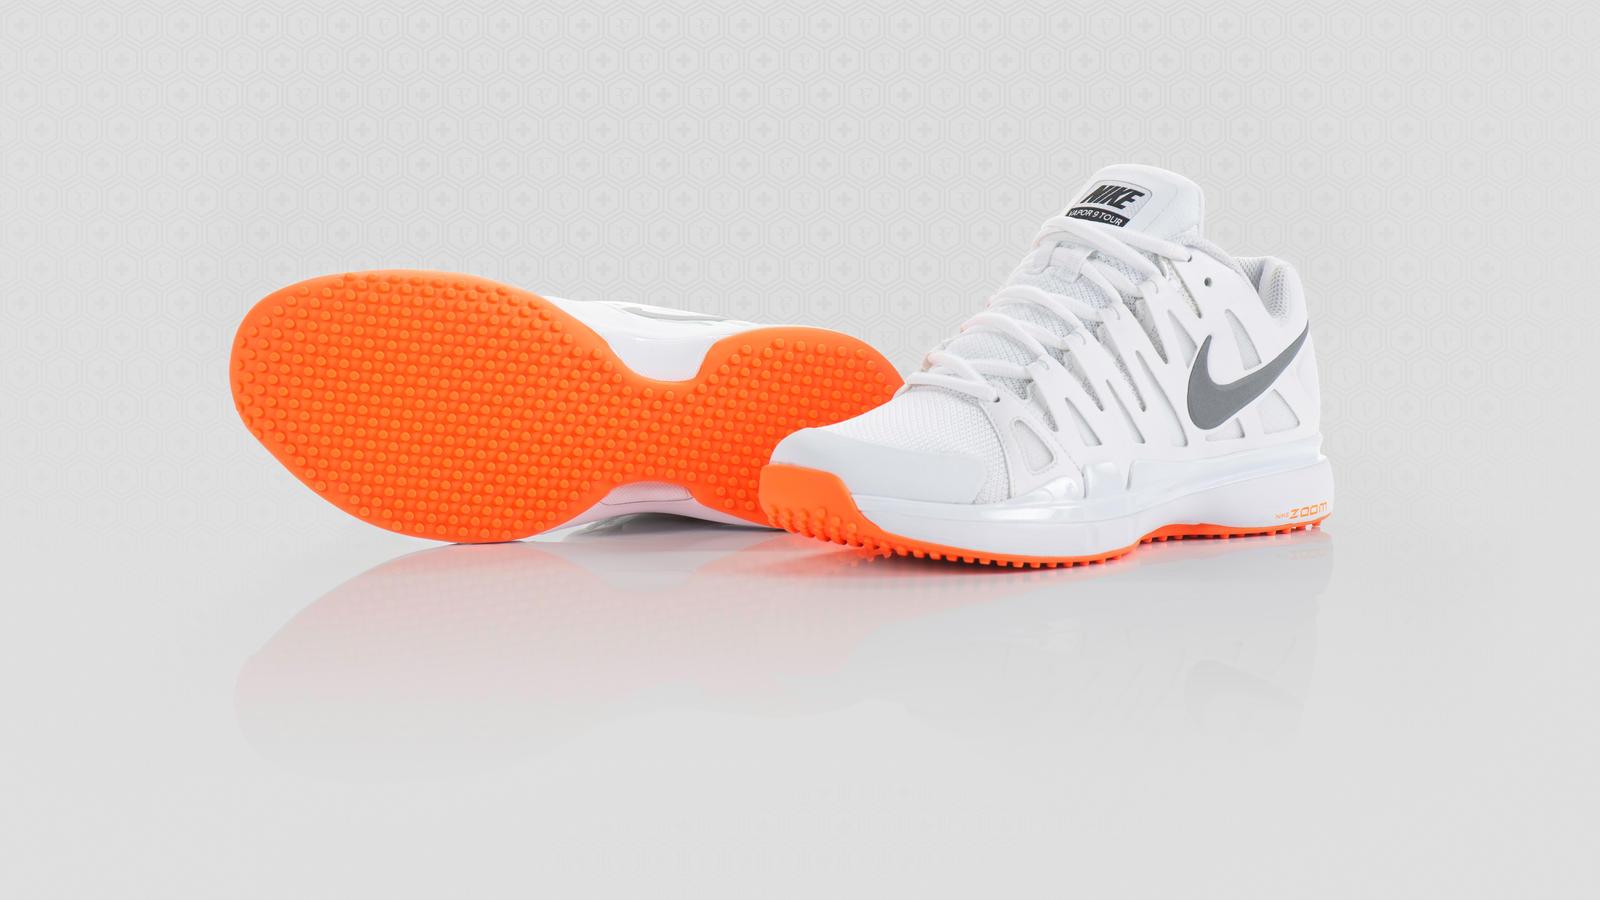 Vapor Roger Zoom Nike Boundaries Tour Federer 9 New Le Pushes In dCeroQxBW